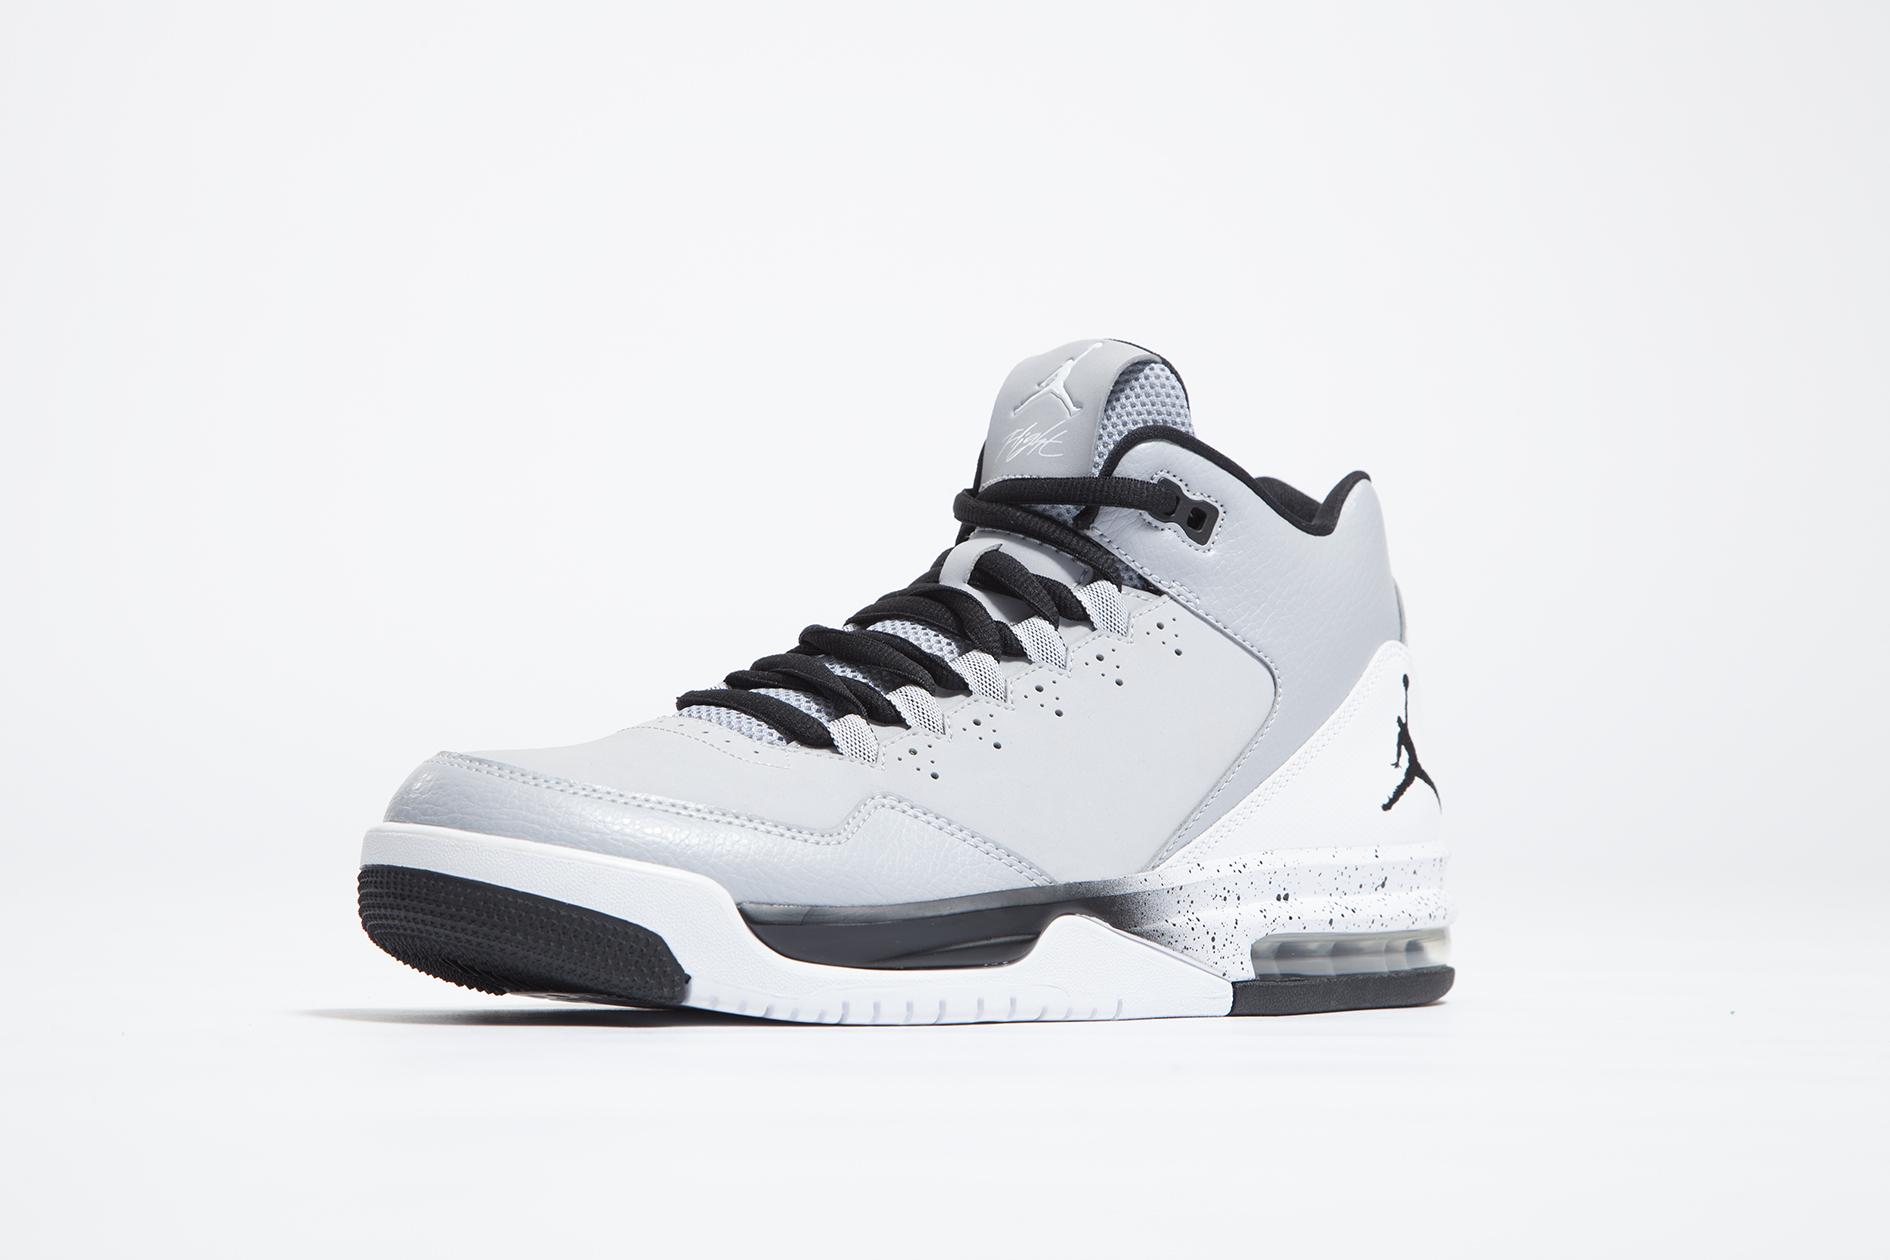 Air Jordan Vol 45 Haut De La Chambre Blanc Gris Noir